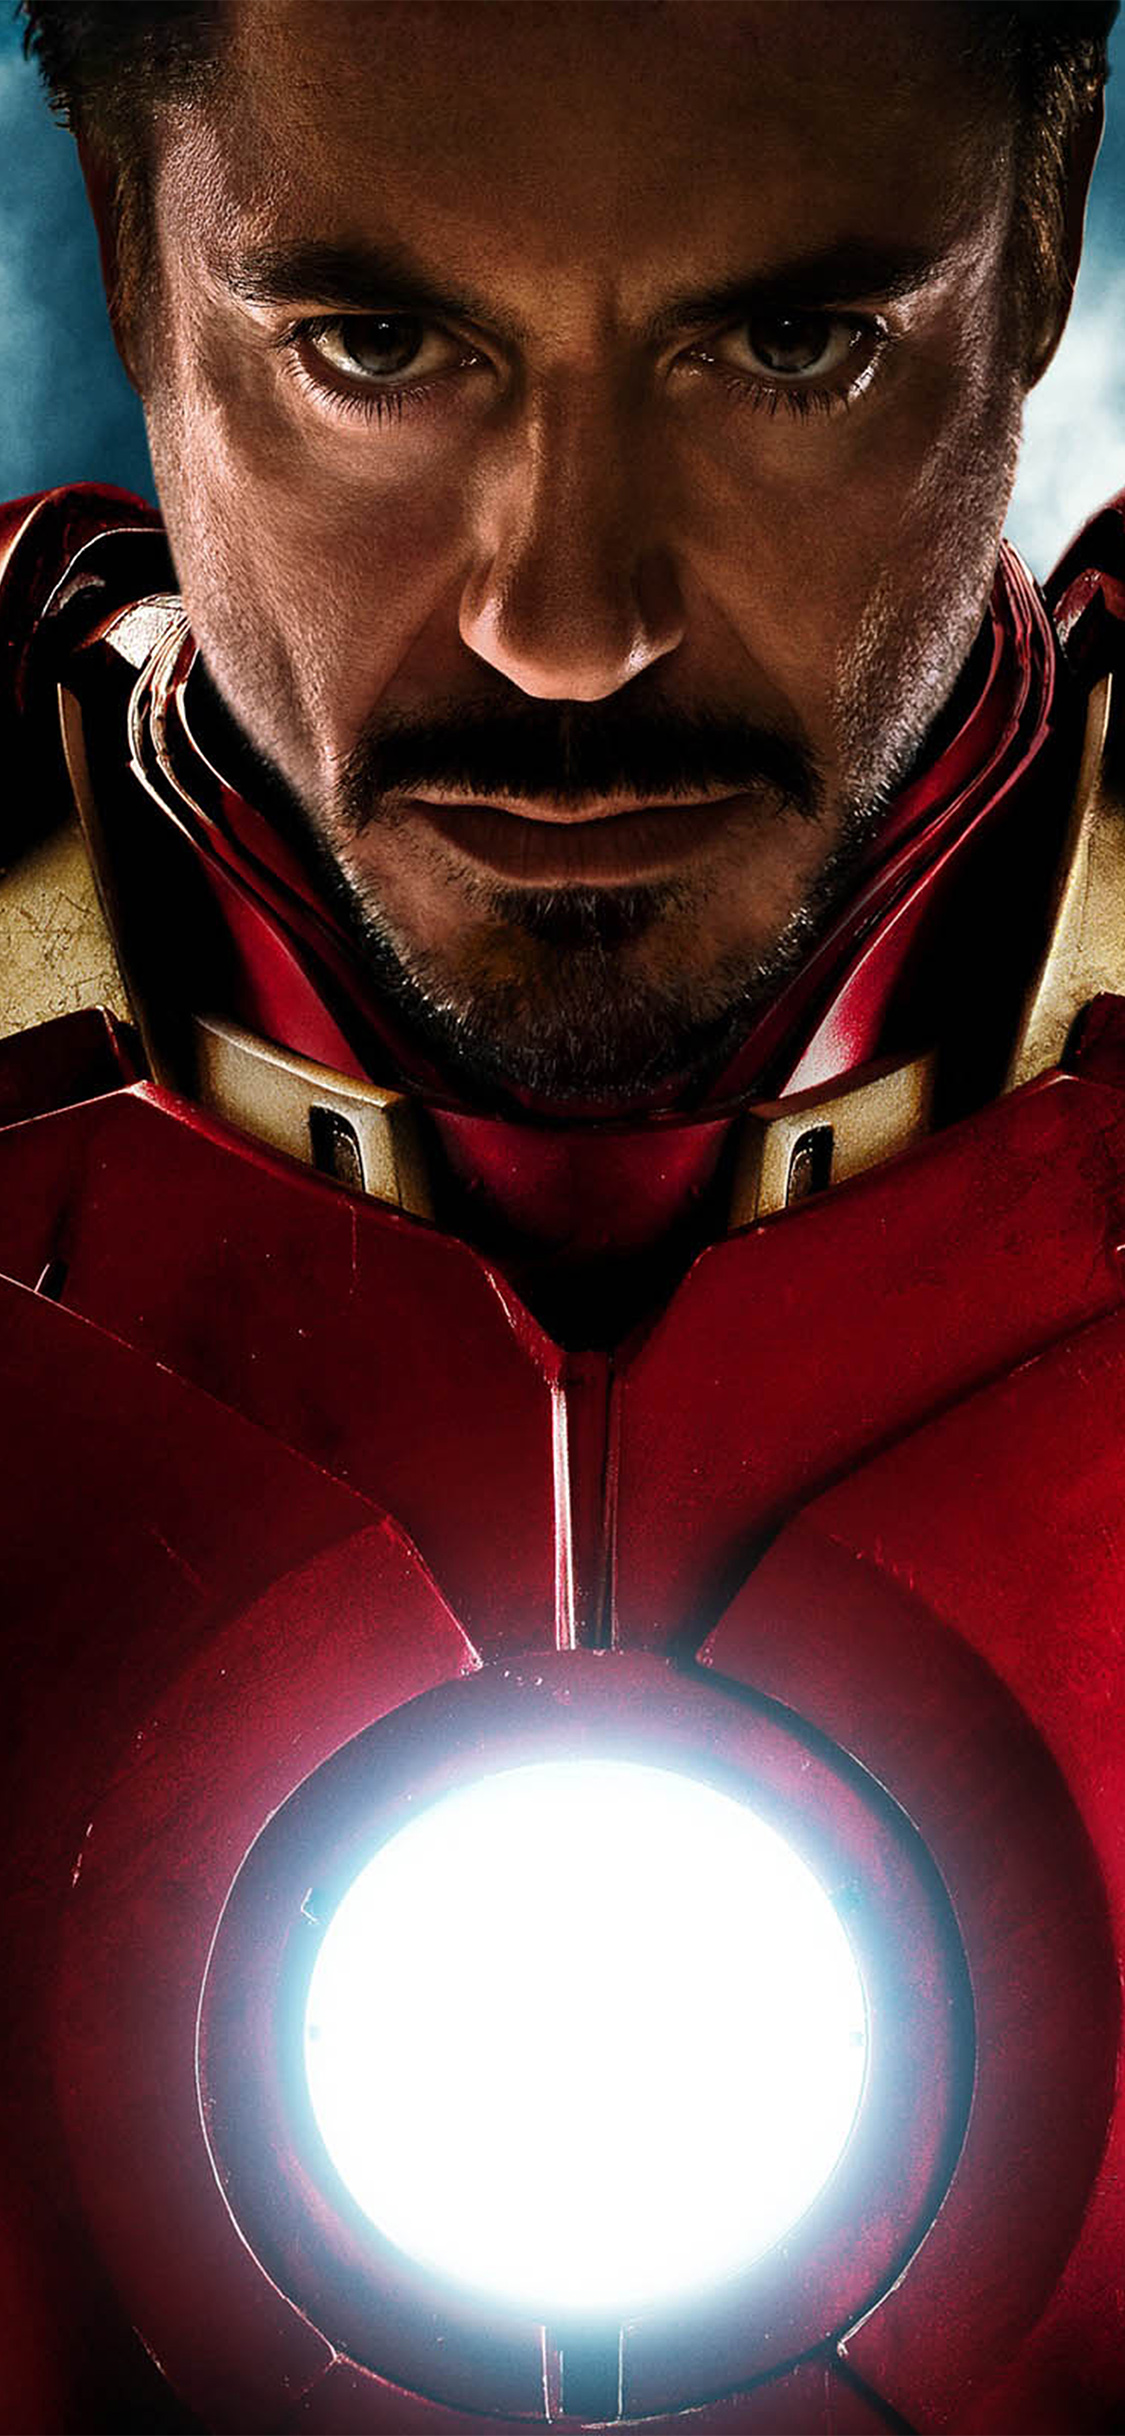 ar45-ironman-angry-hero-superhero-red-avengers-wallpaper